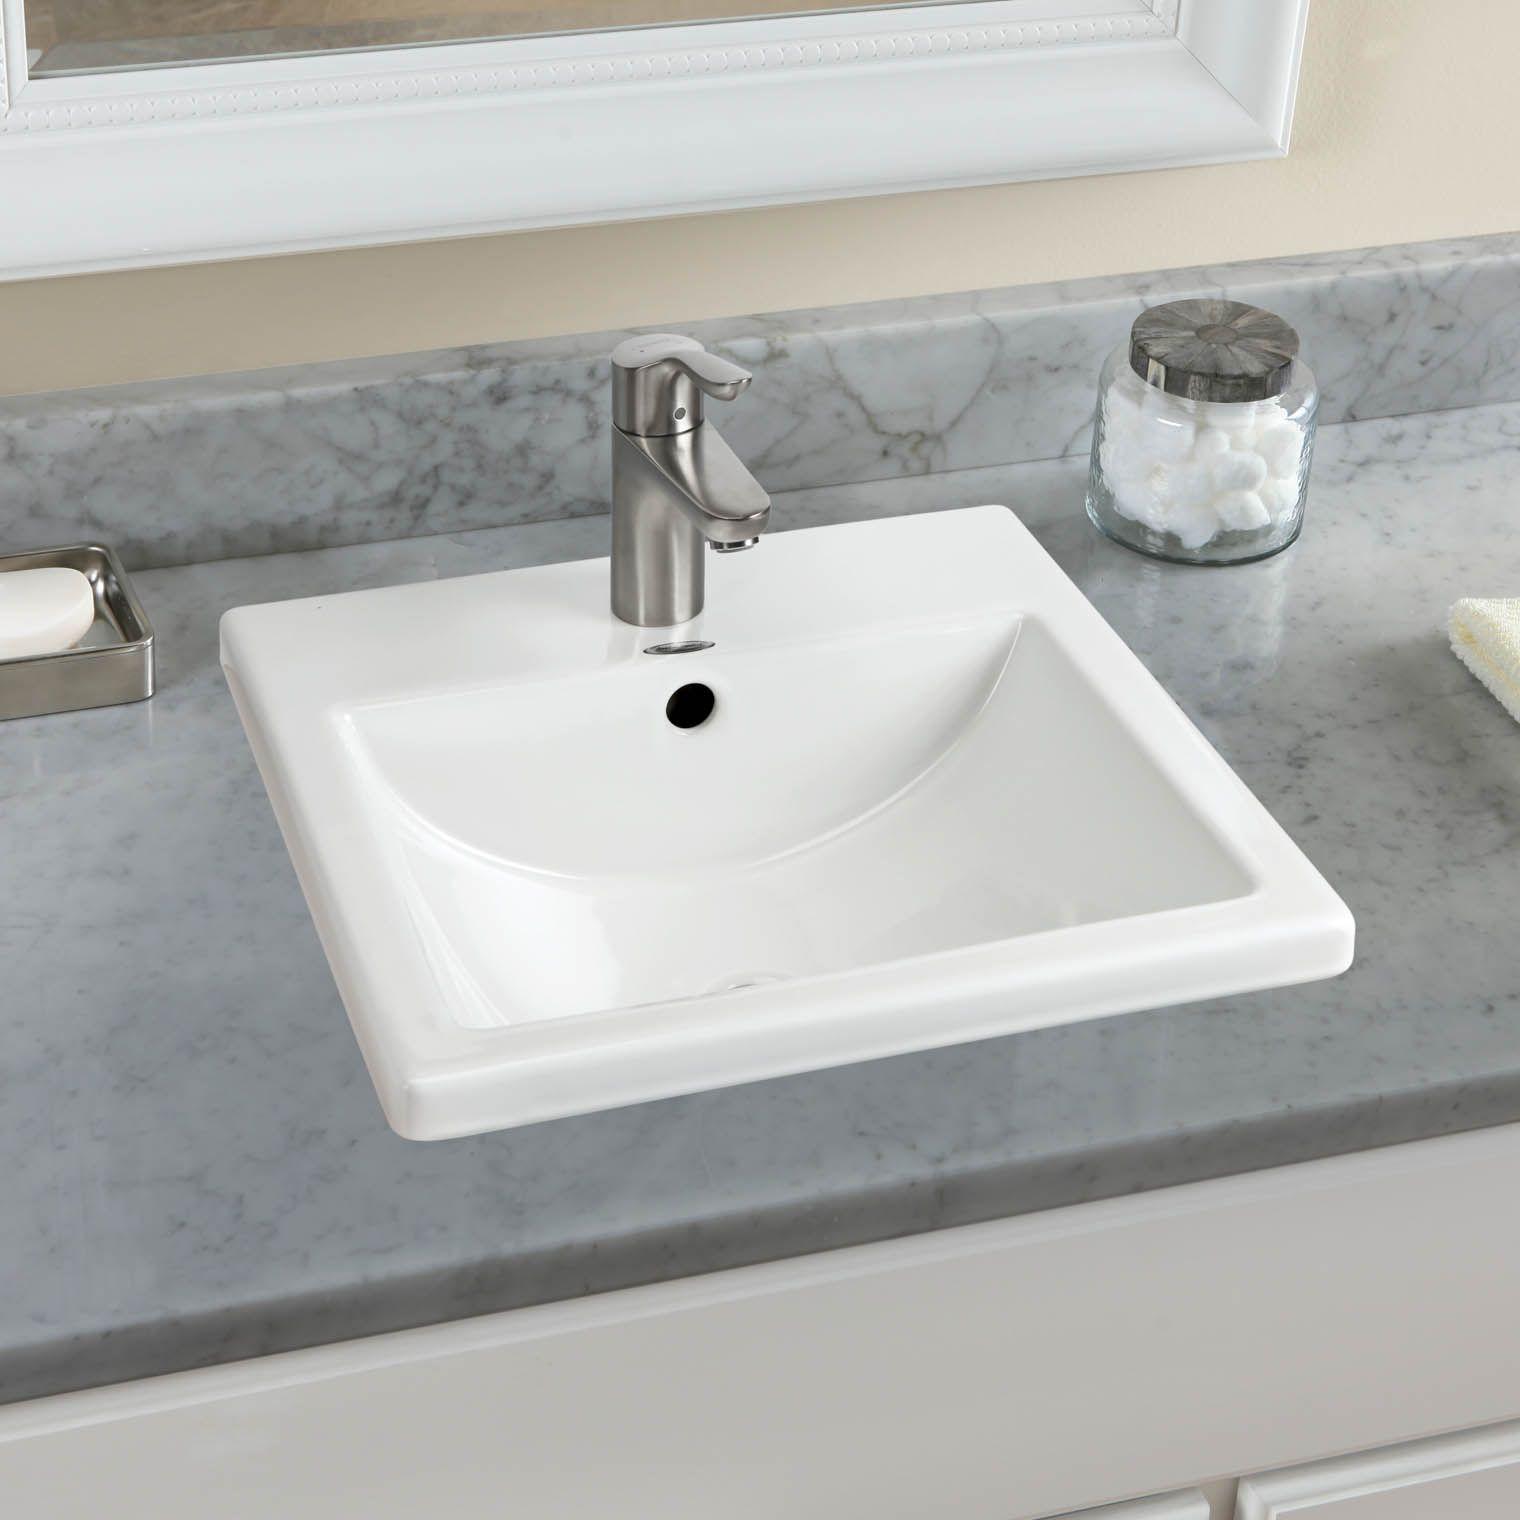 Studio Carre 16 3 8 Drop In Bathroom Sink For Single Hole